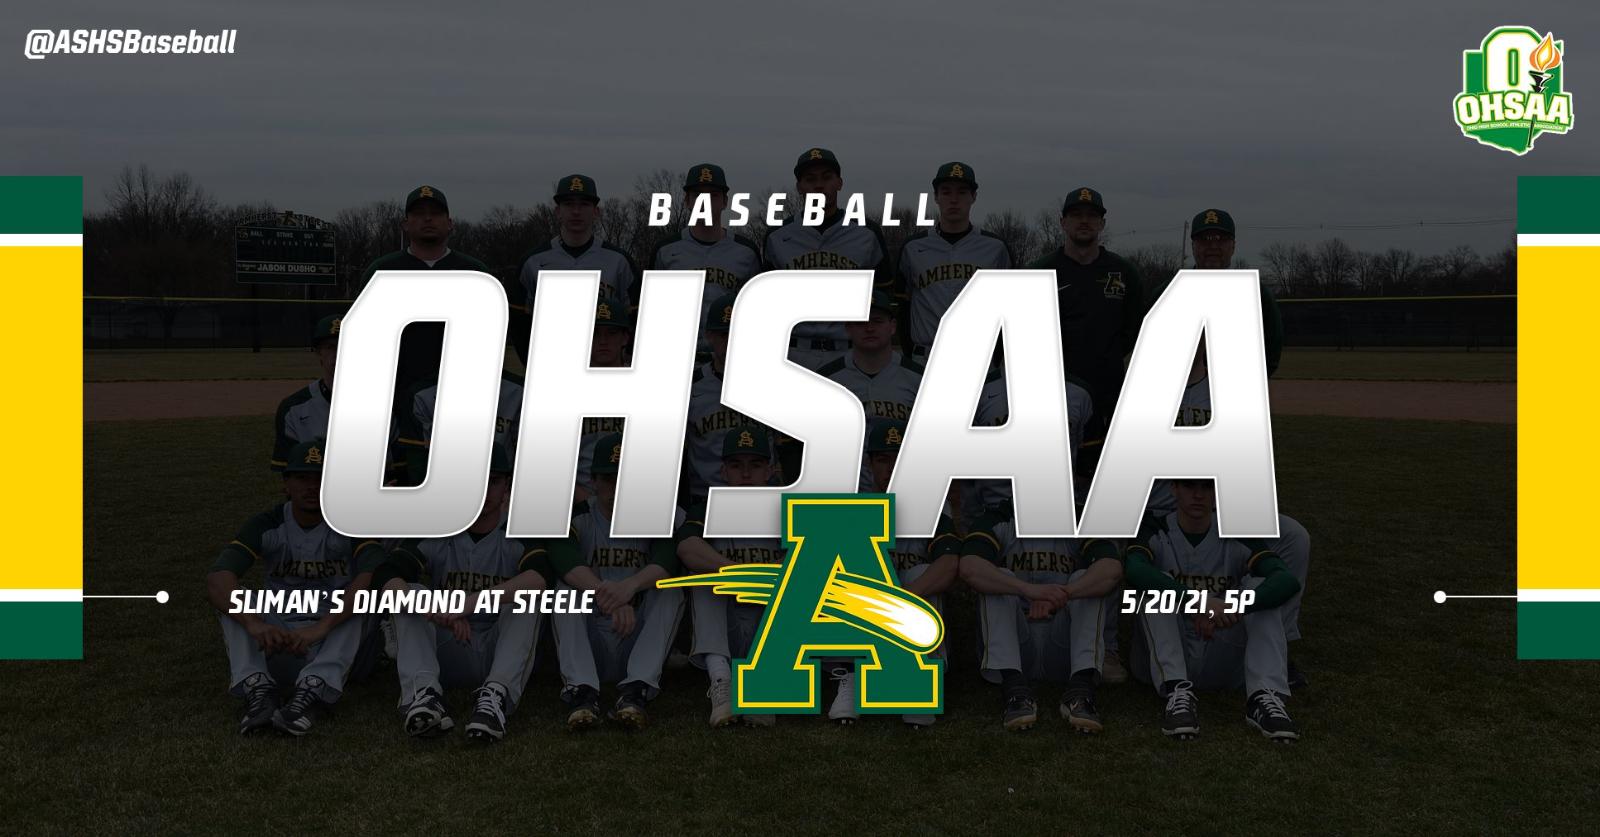 @ASHSBaseball Opens OHSAA Play on 5/20/21